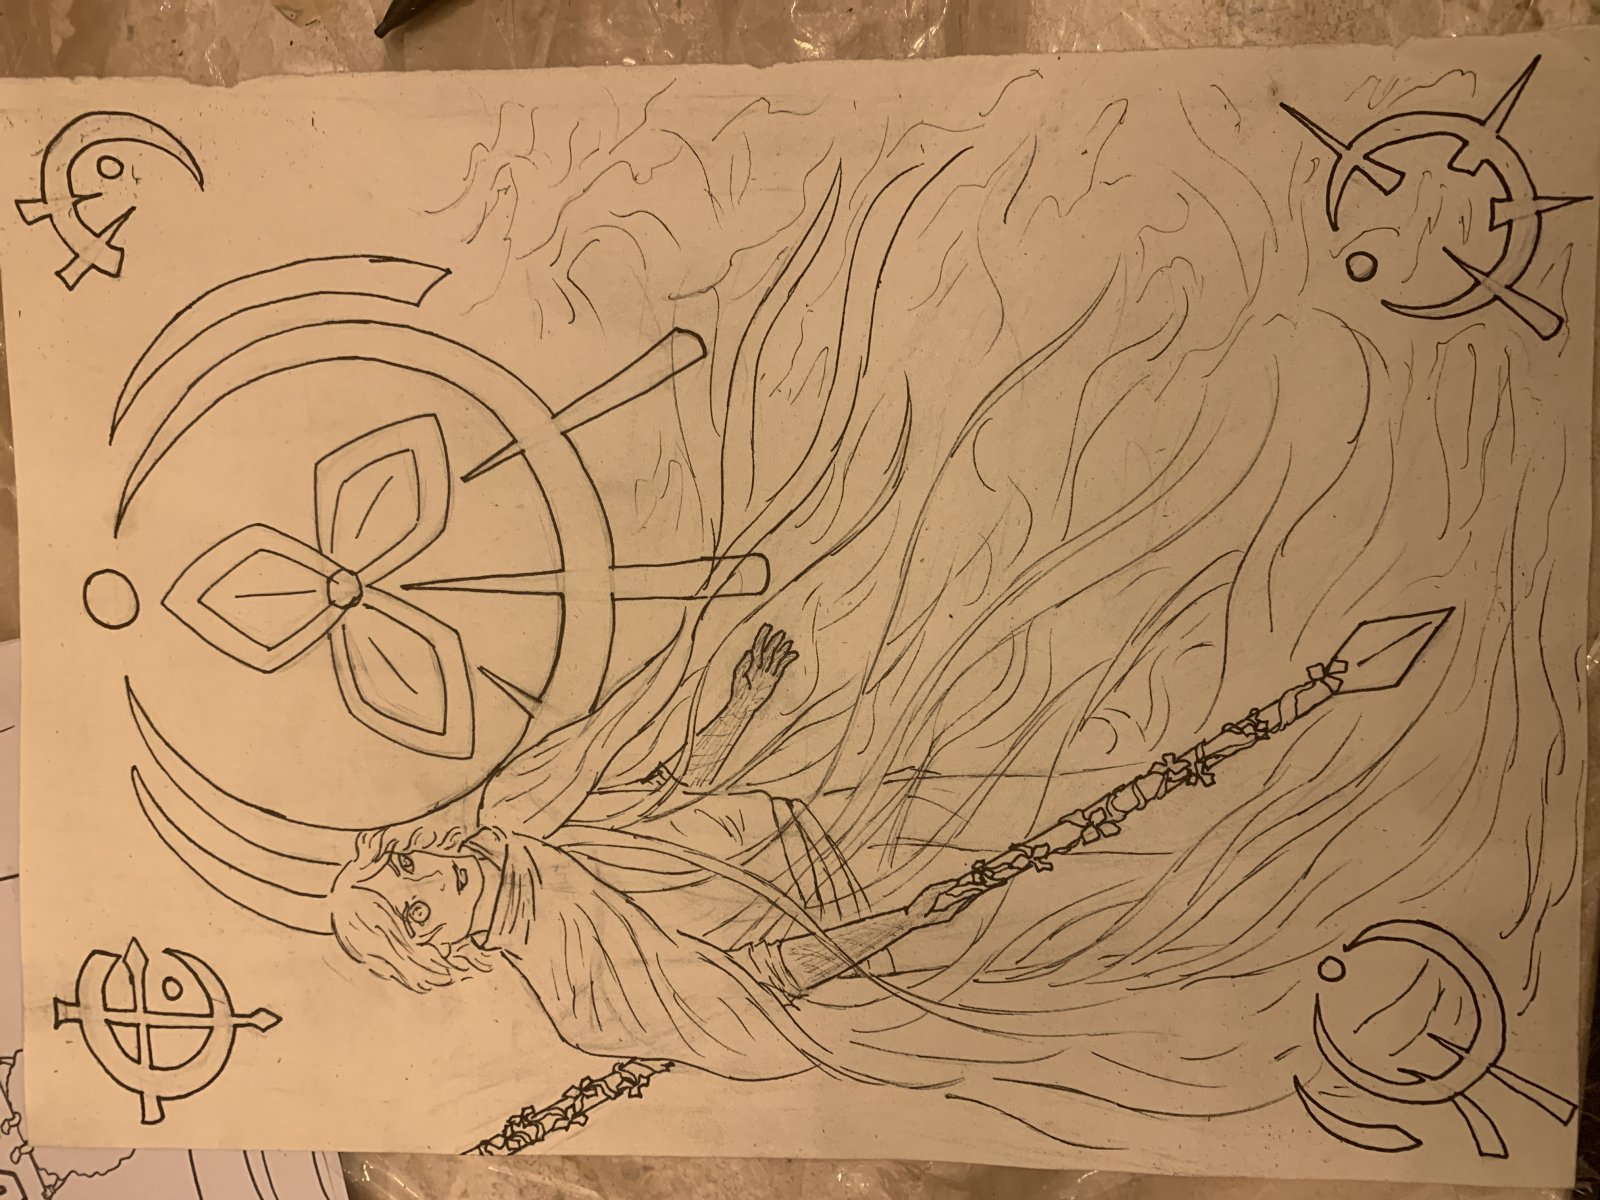 Survivorist art inked